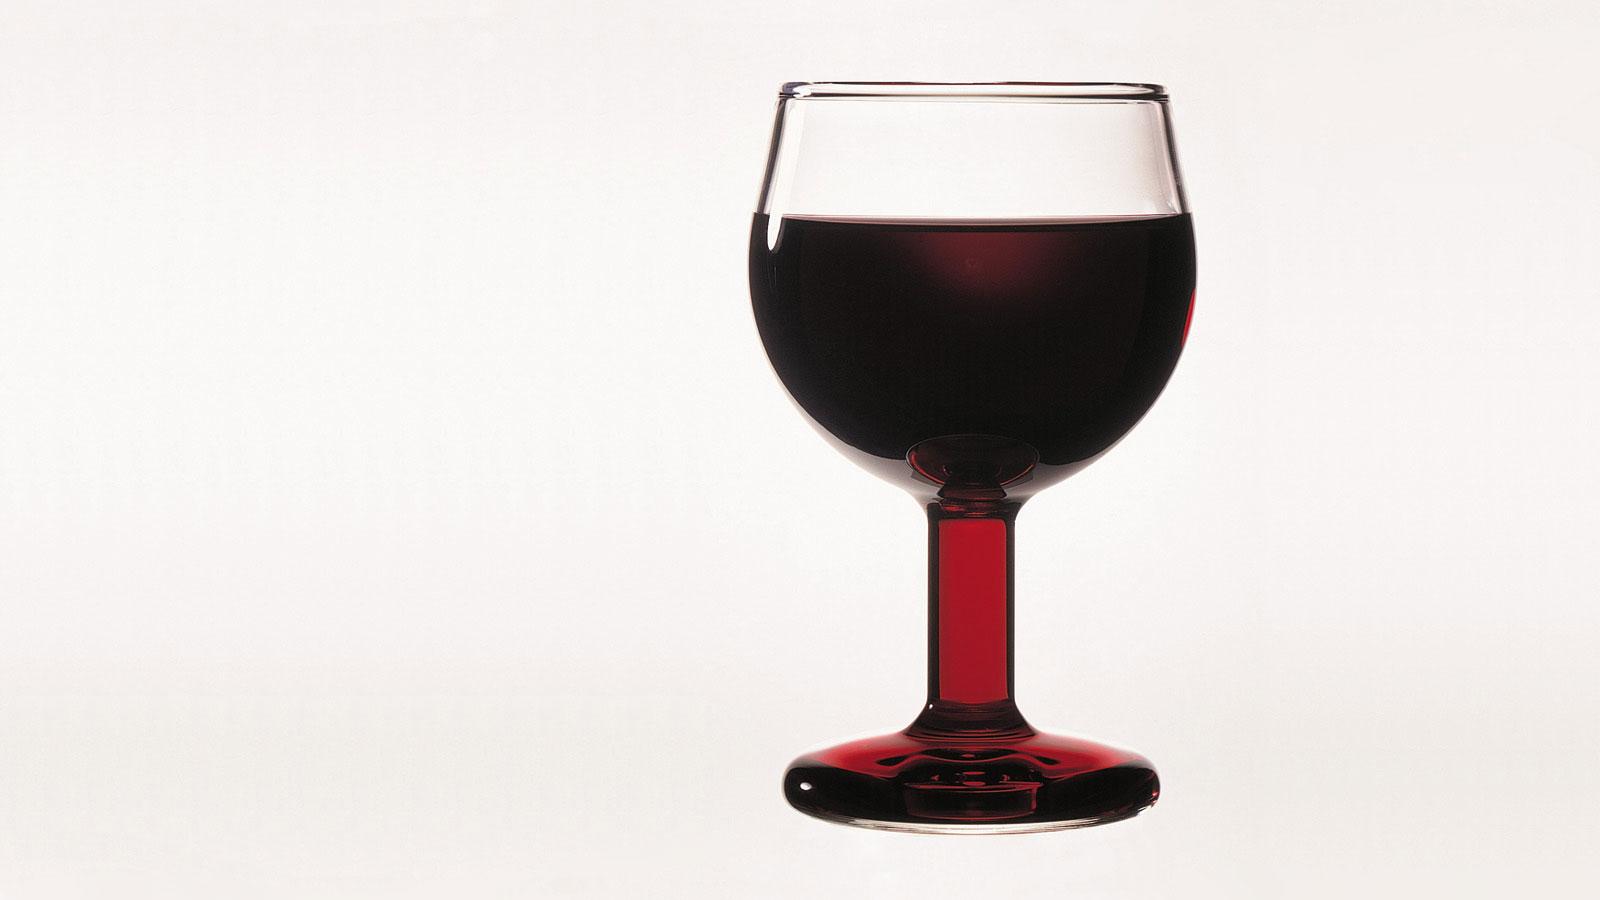 verre rouge verre ballon revisit sa jambe et son pied. Black Bedroom Furniture Sets. Home Design Ideas